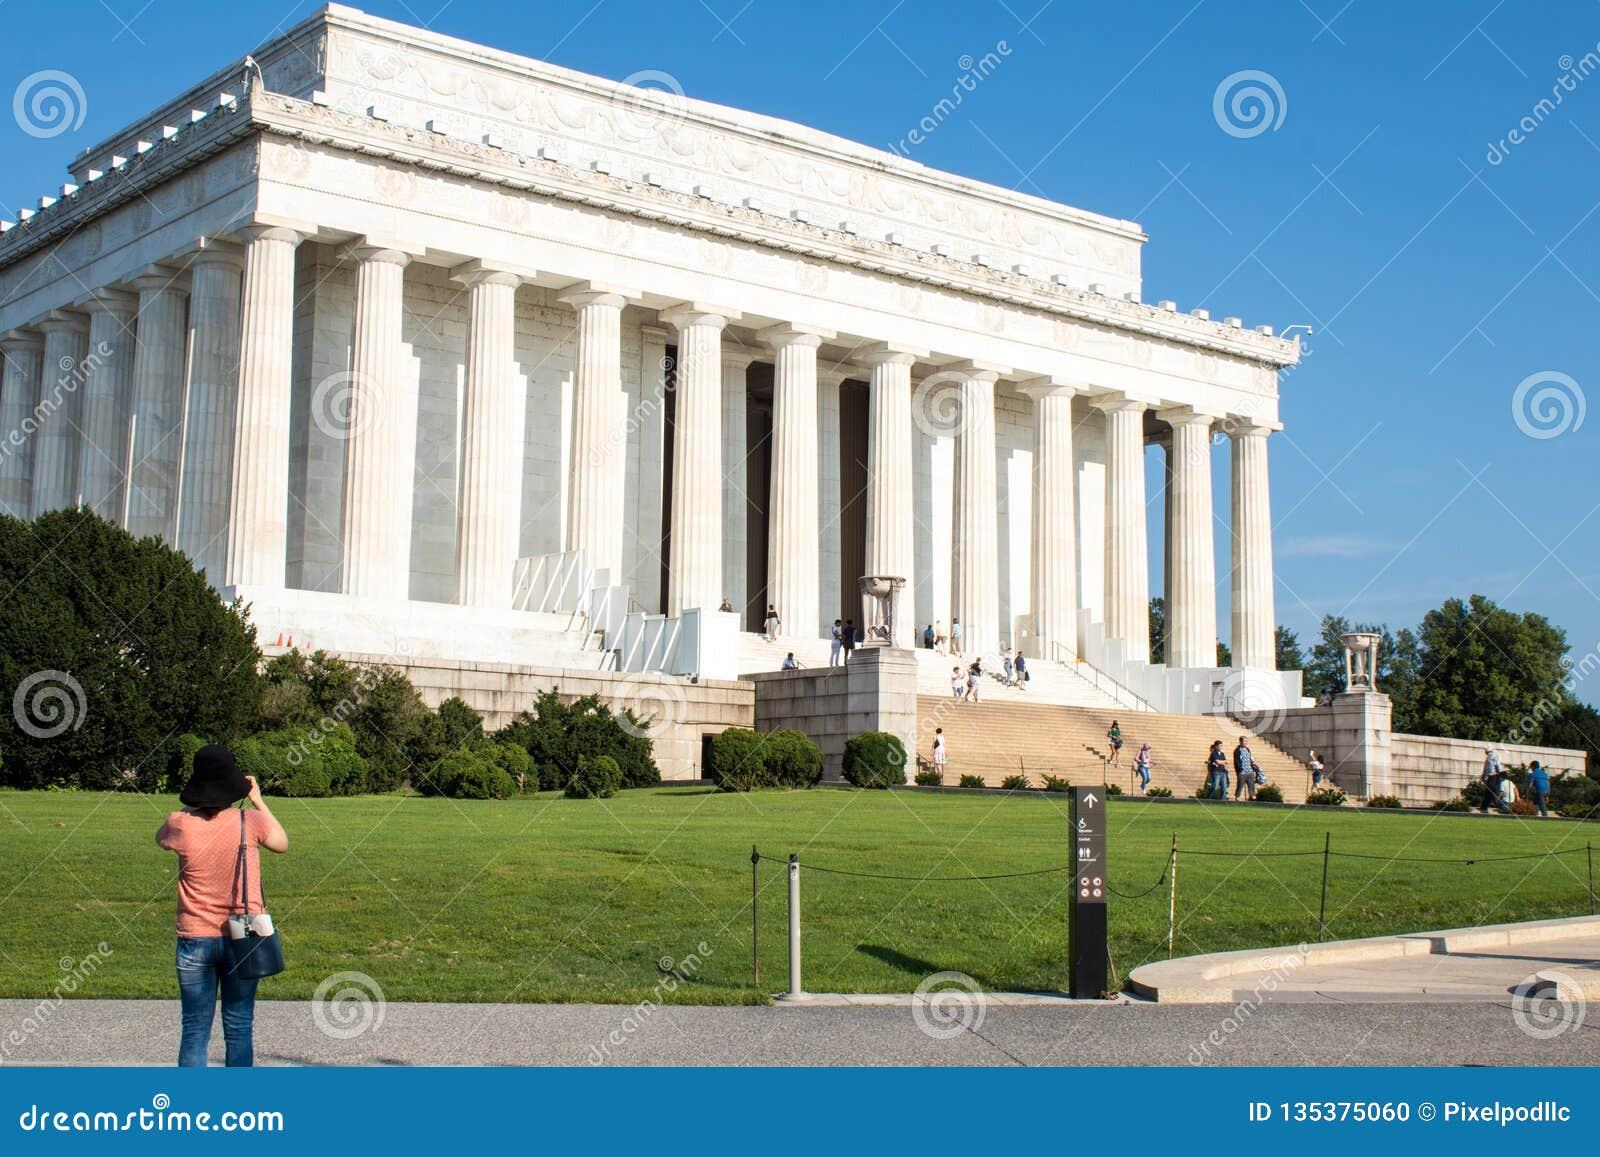 The majestic Lincoln Memorial, Washington D.C,